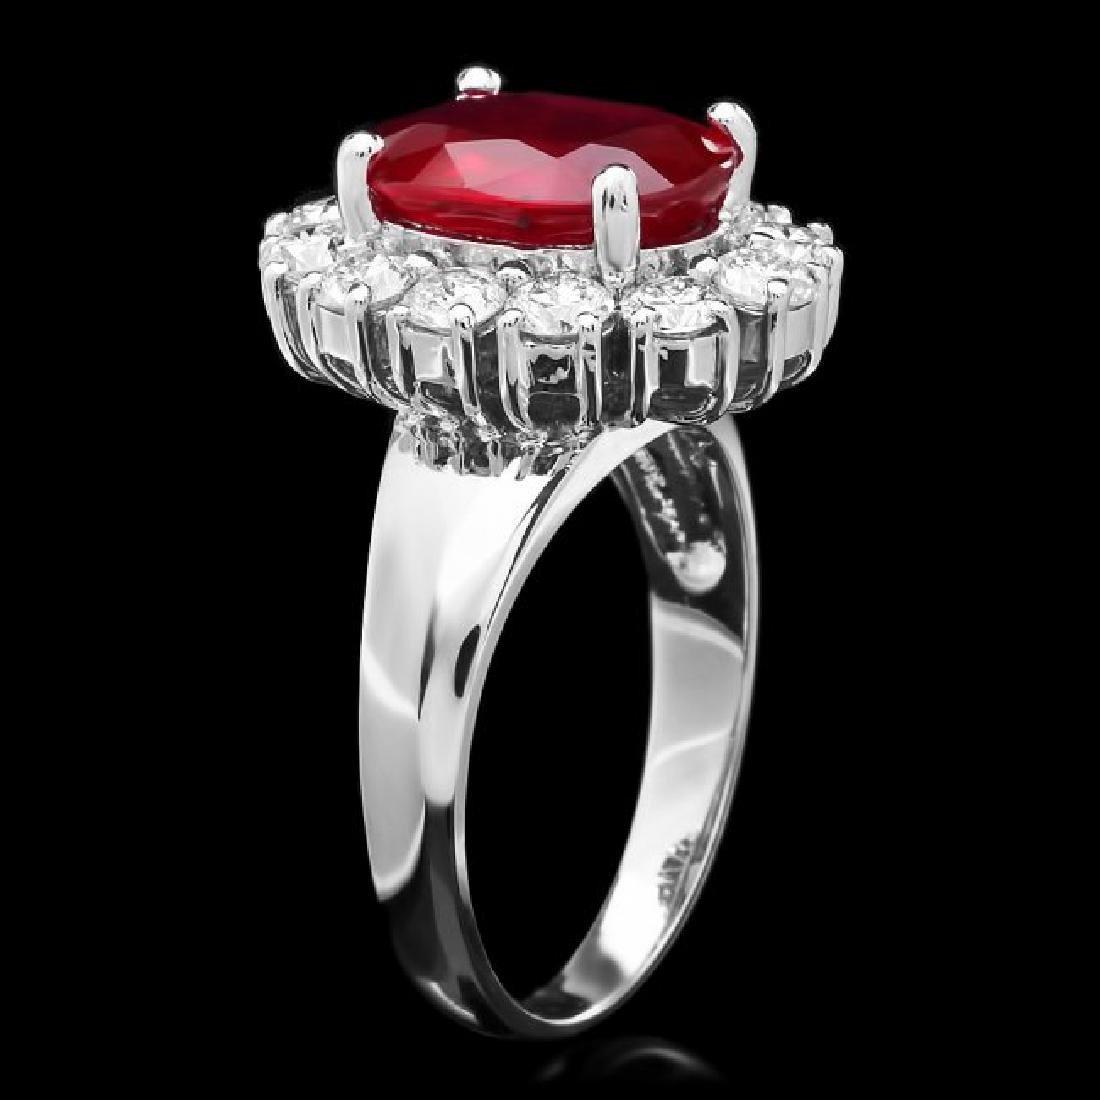 14k White Gold 4.30ct Ruby 1.40ct Diamond Ring - 2